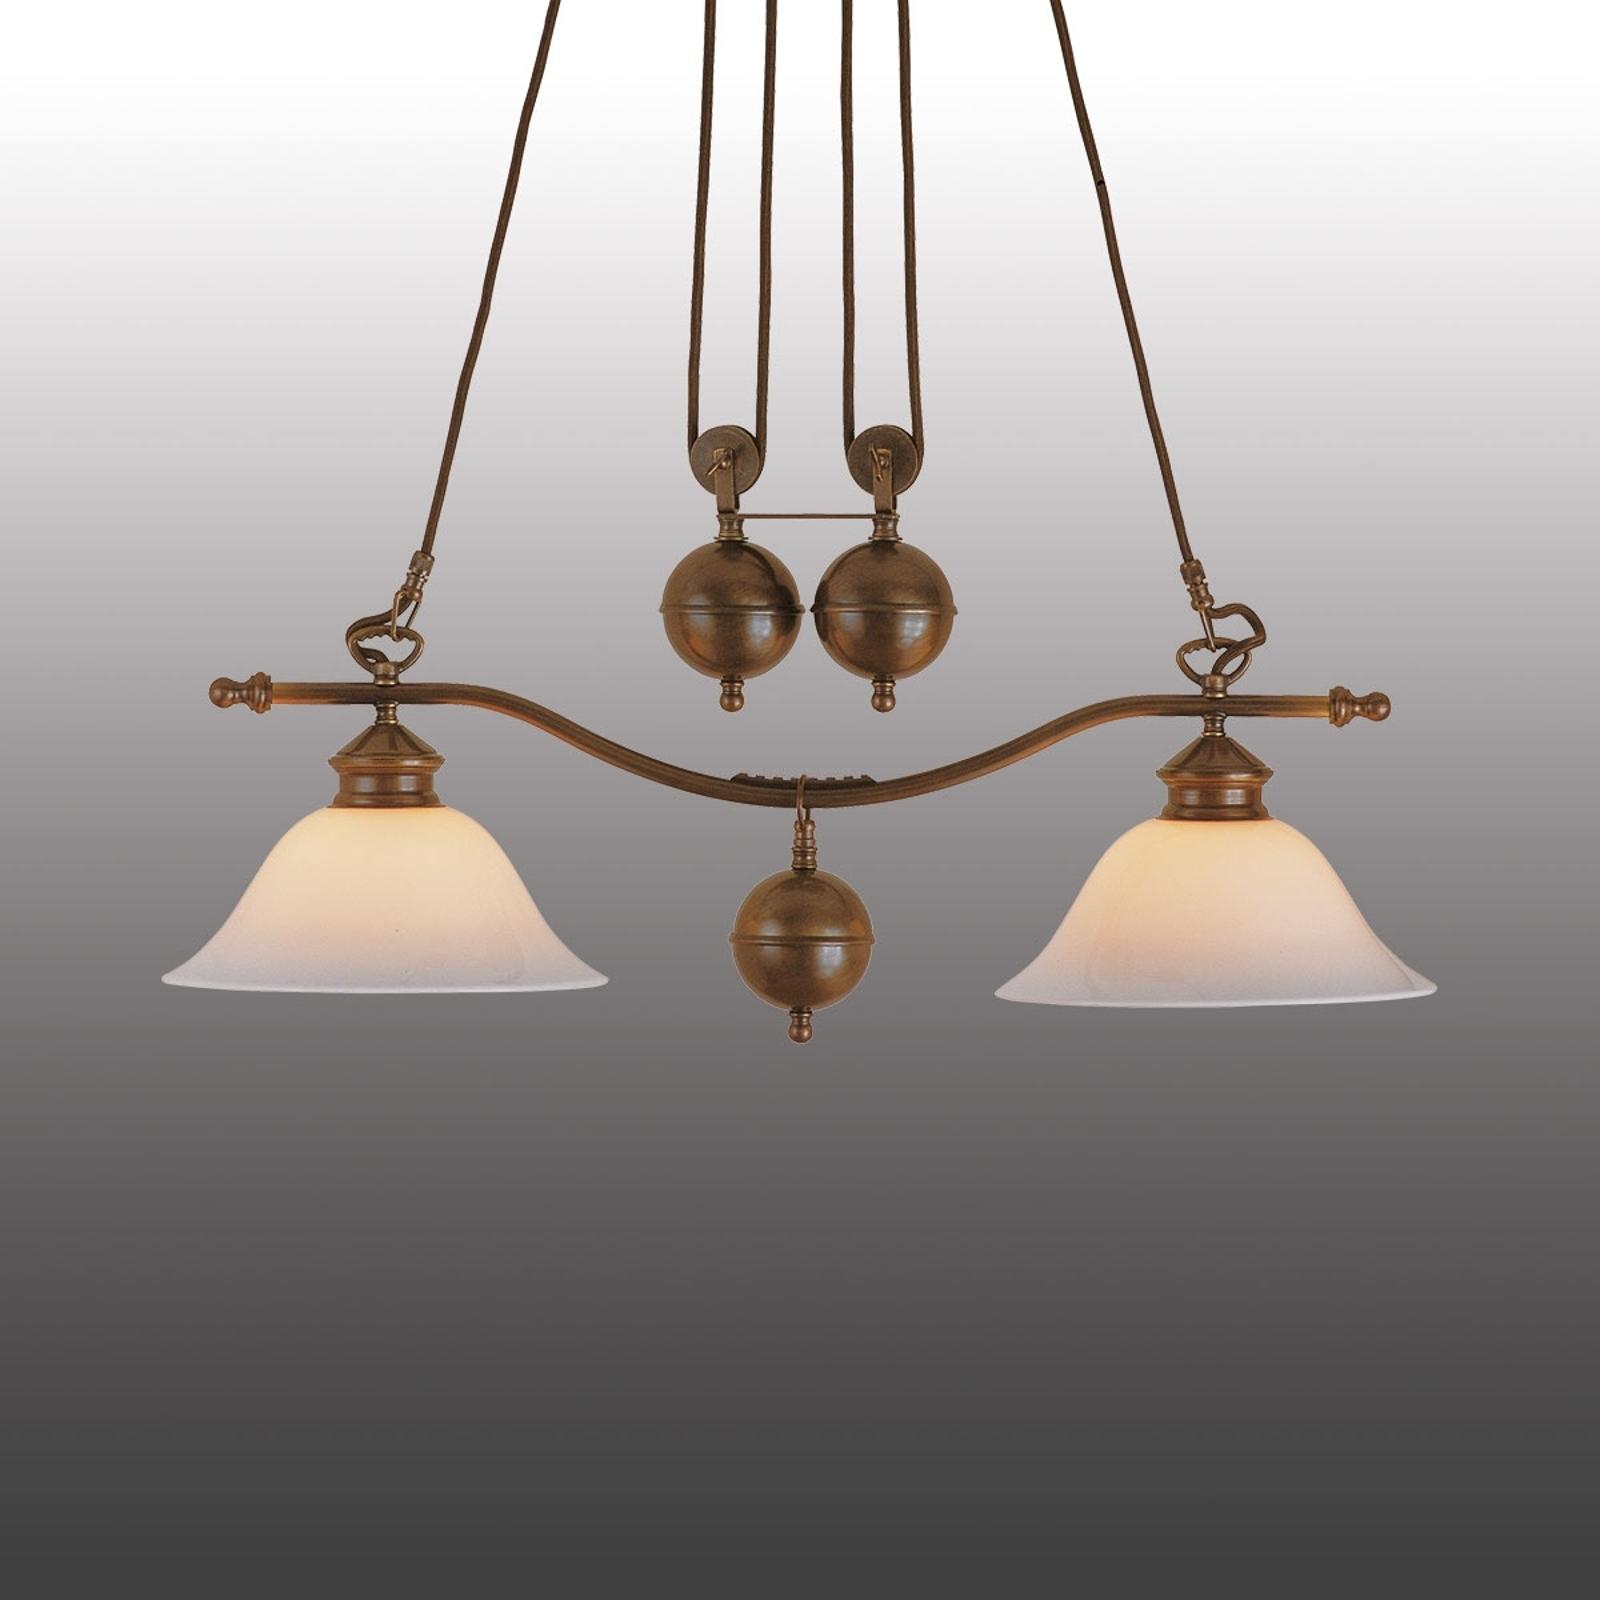 2-punktowa lampa wisząca Anno 1900